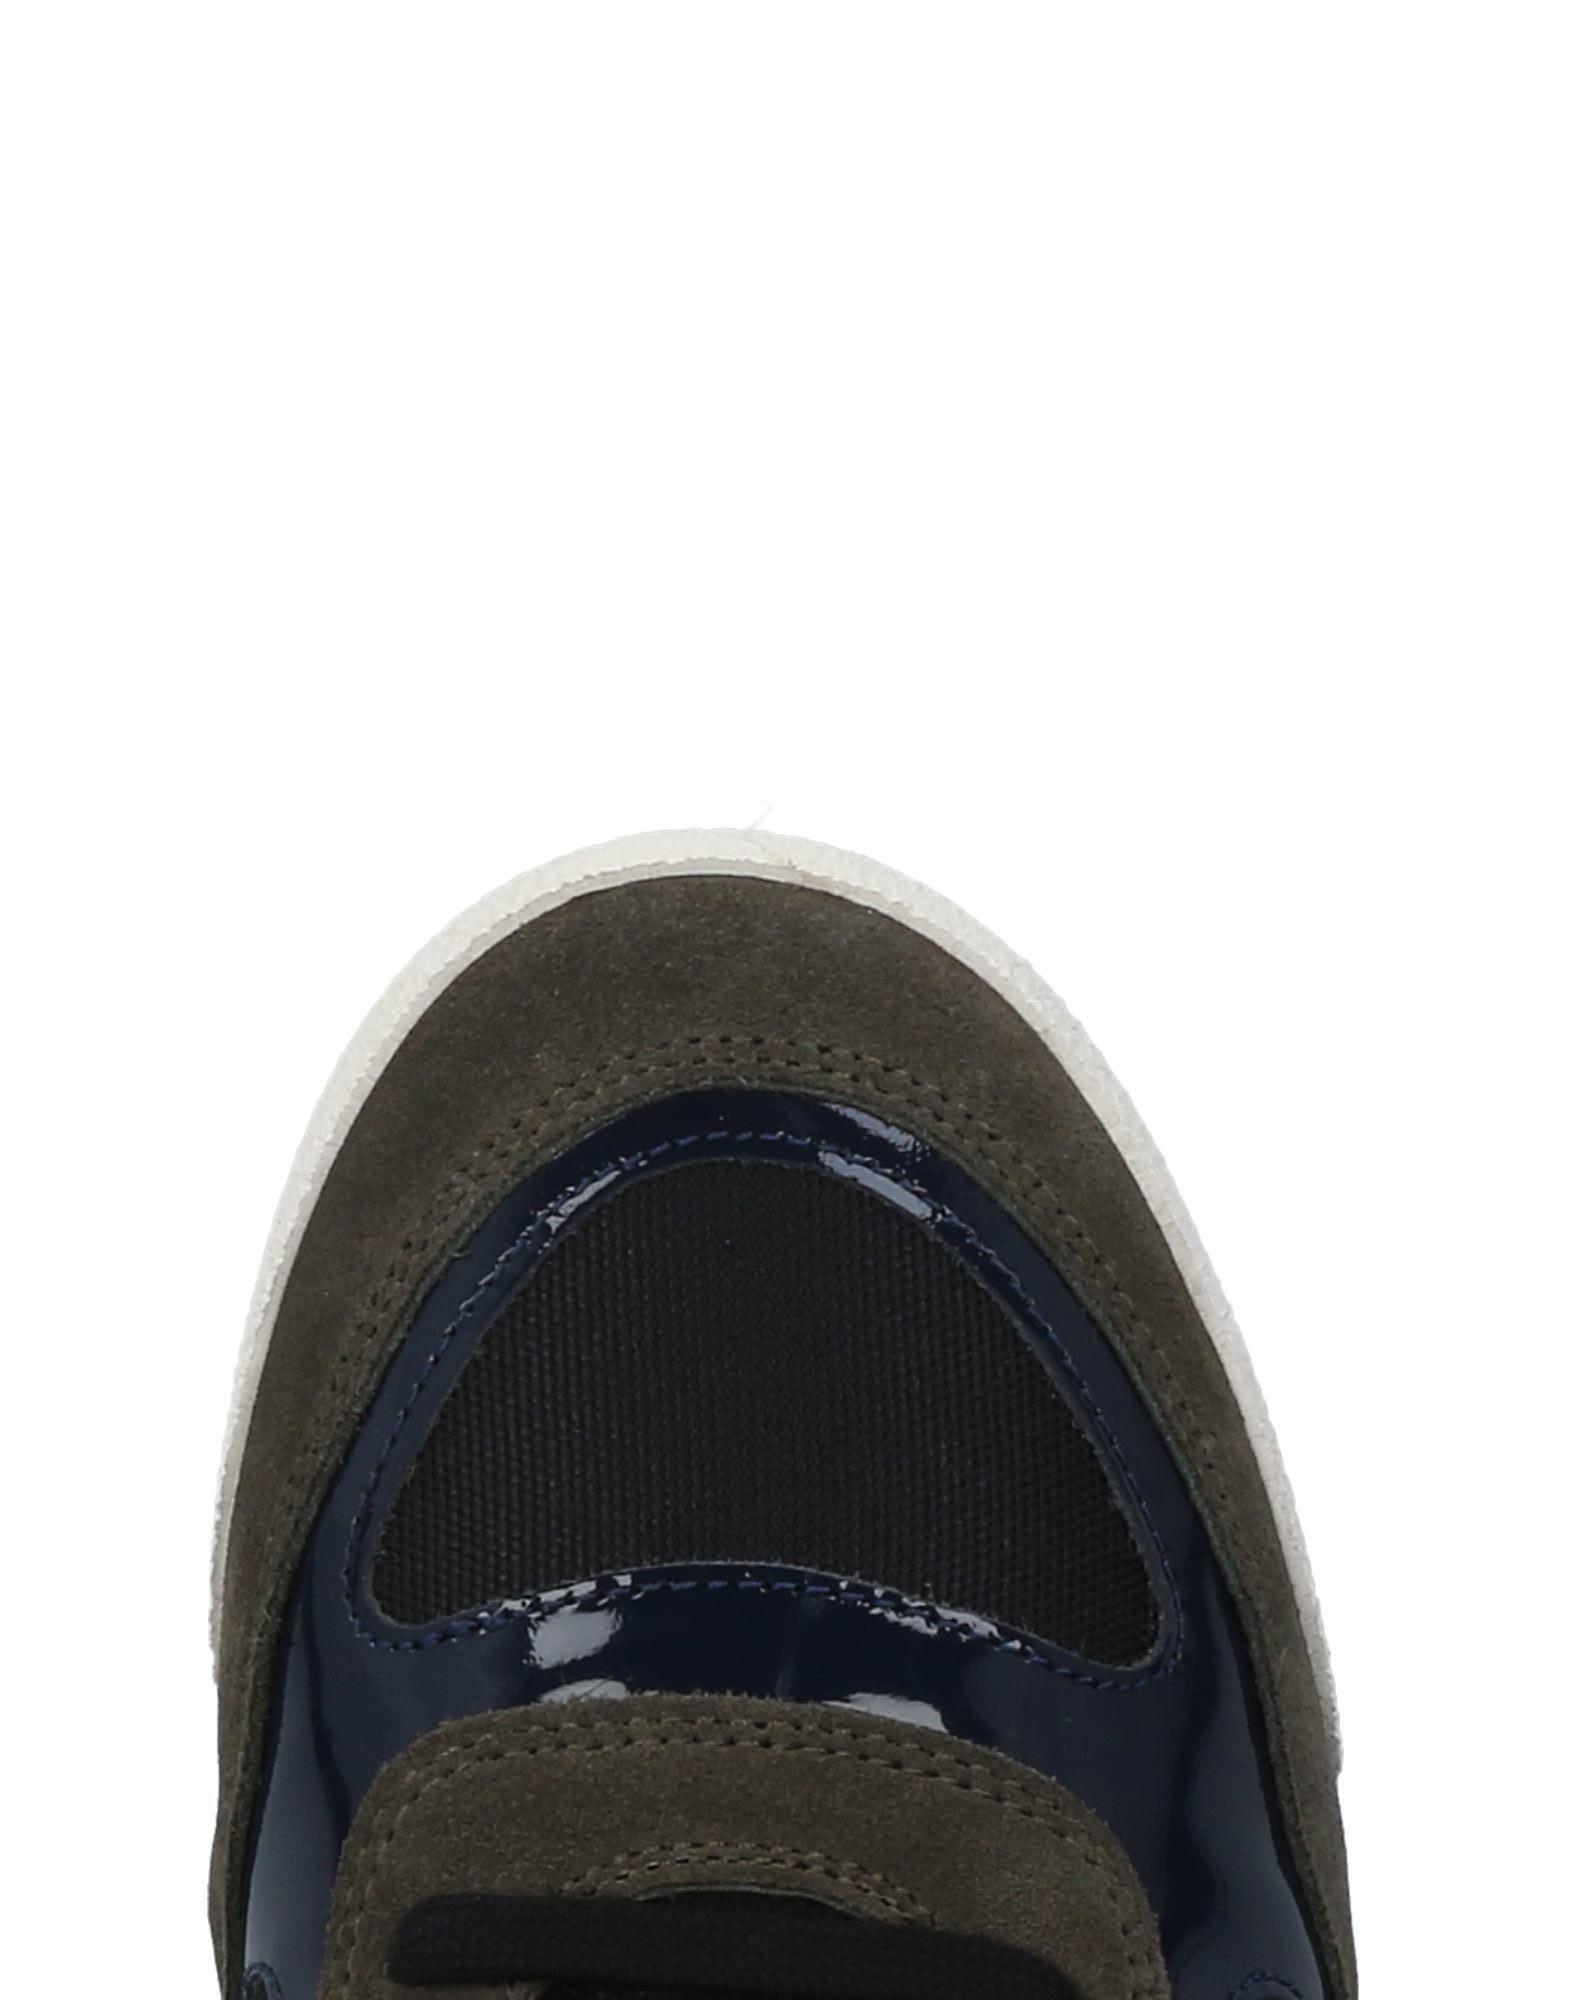 Just Cavalli Sneakers - Men on Just Cavalli Sneakers online on Men  Canada - 11473025MK 505e3e